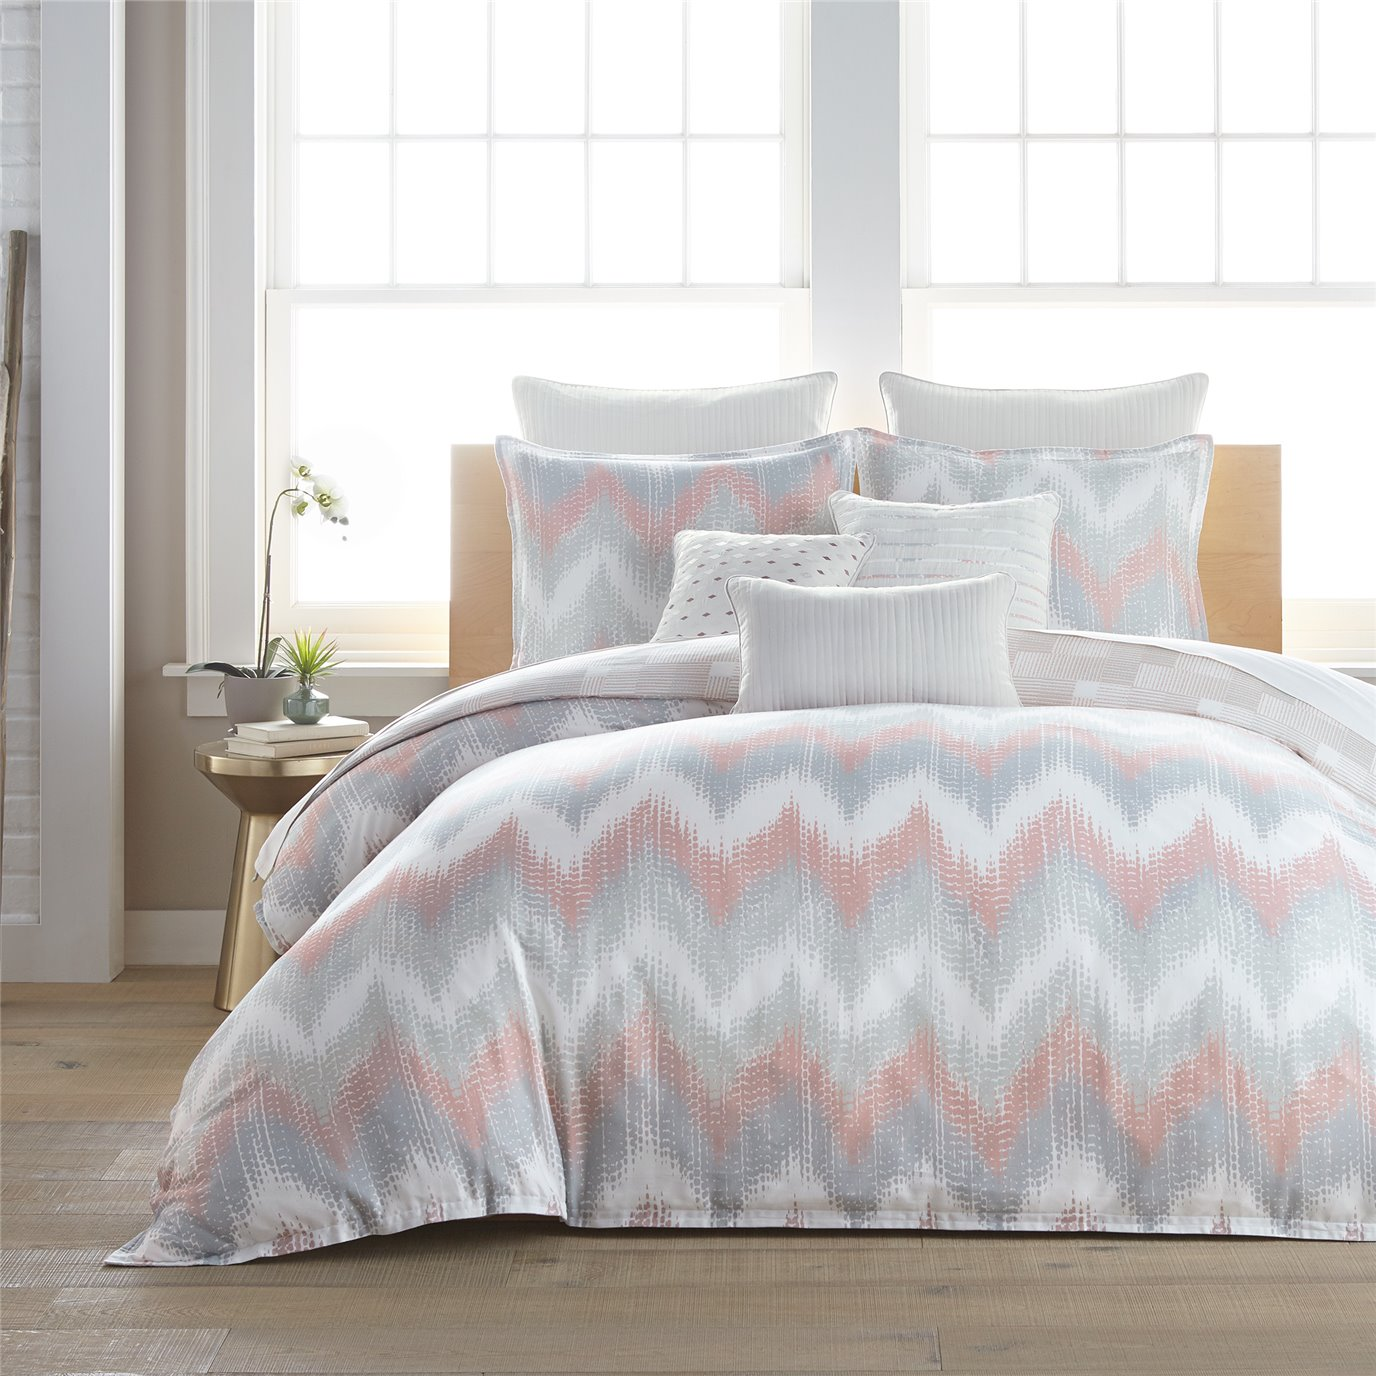 Croscill Clapton Queen 3PC Comforter Set